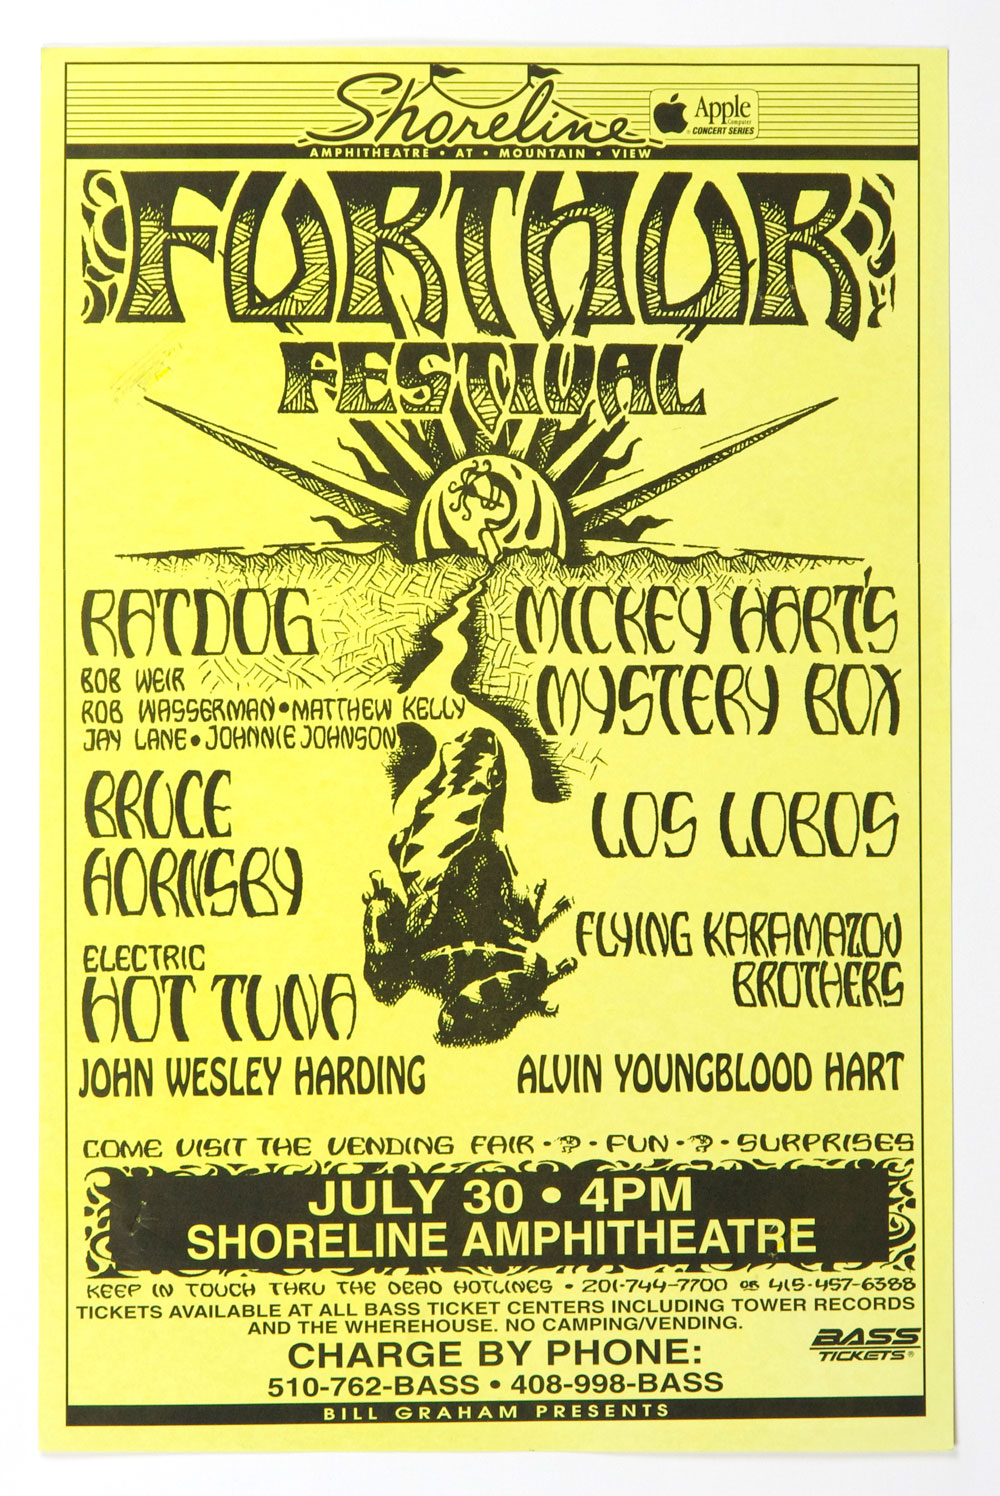 Bob Weir Mickey Hart Poster 1996 Jul 30 Shoreline Amphitheatre